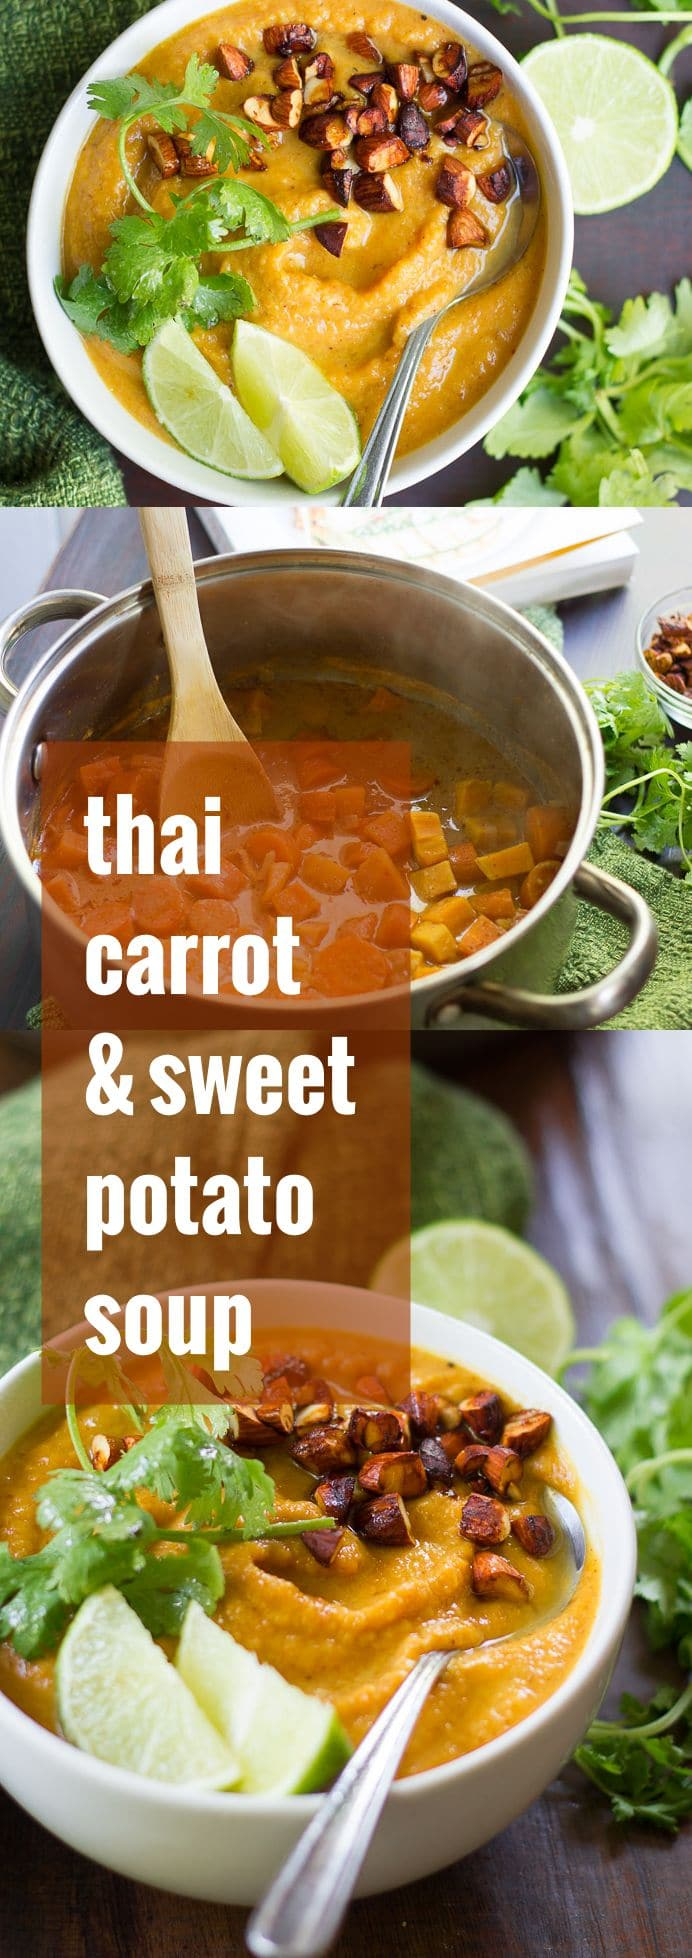 Creamy Thai Carrot Sweet Potato Soup with Roasted Tamari Almonds